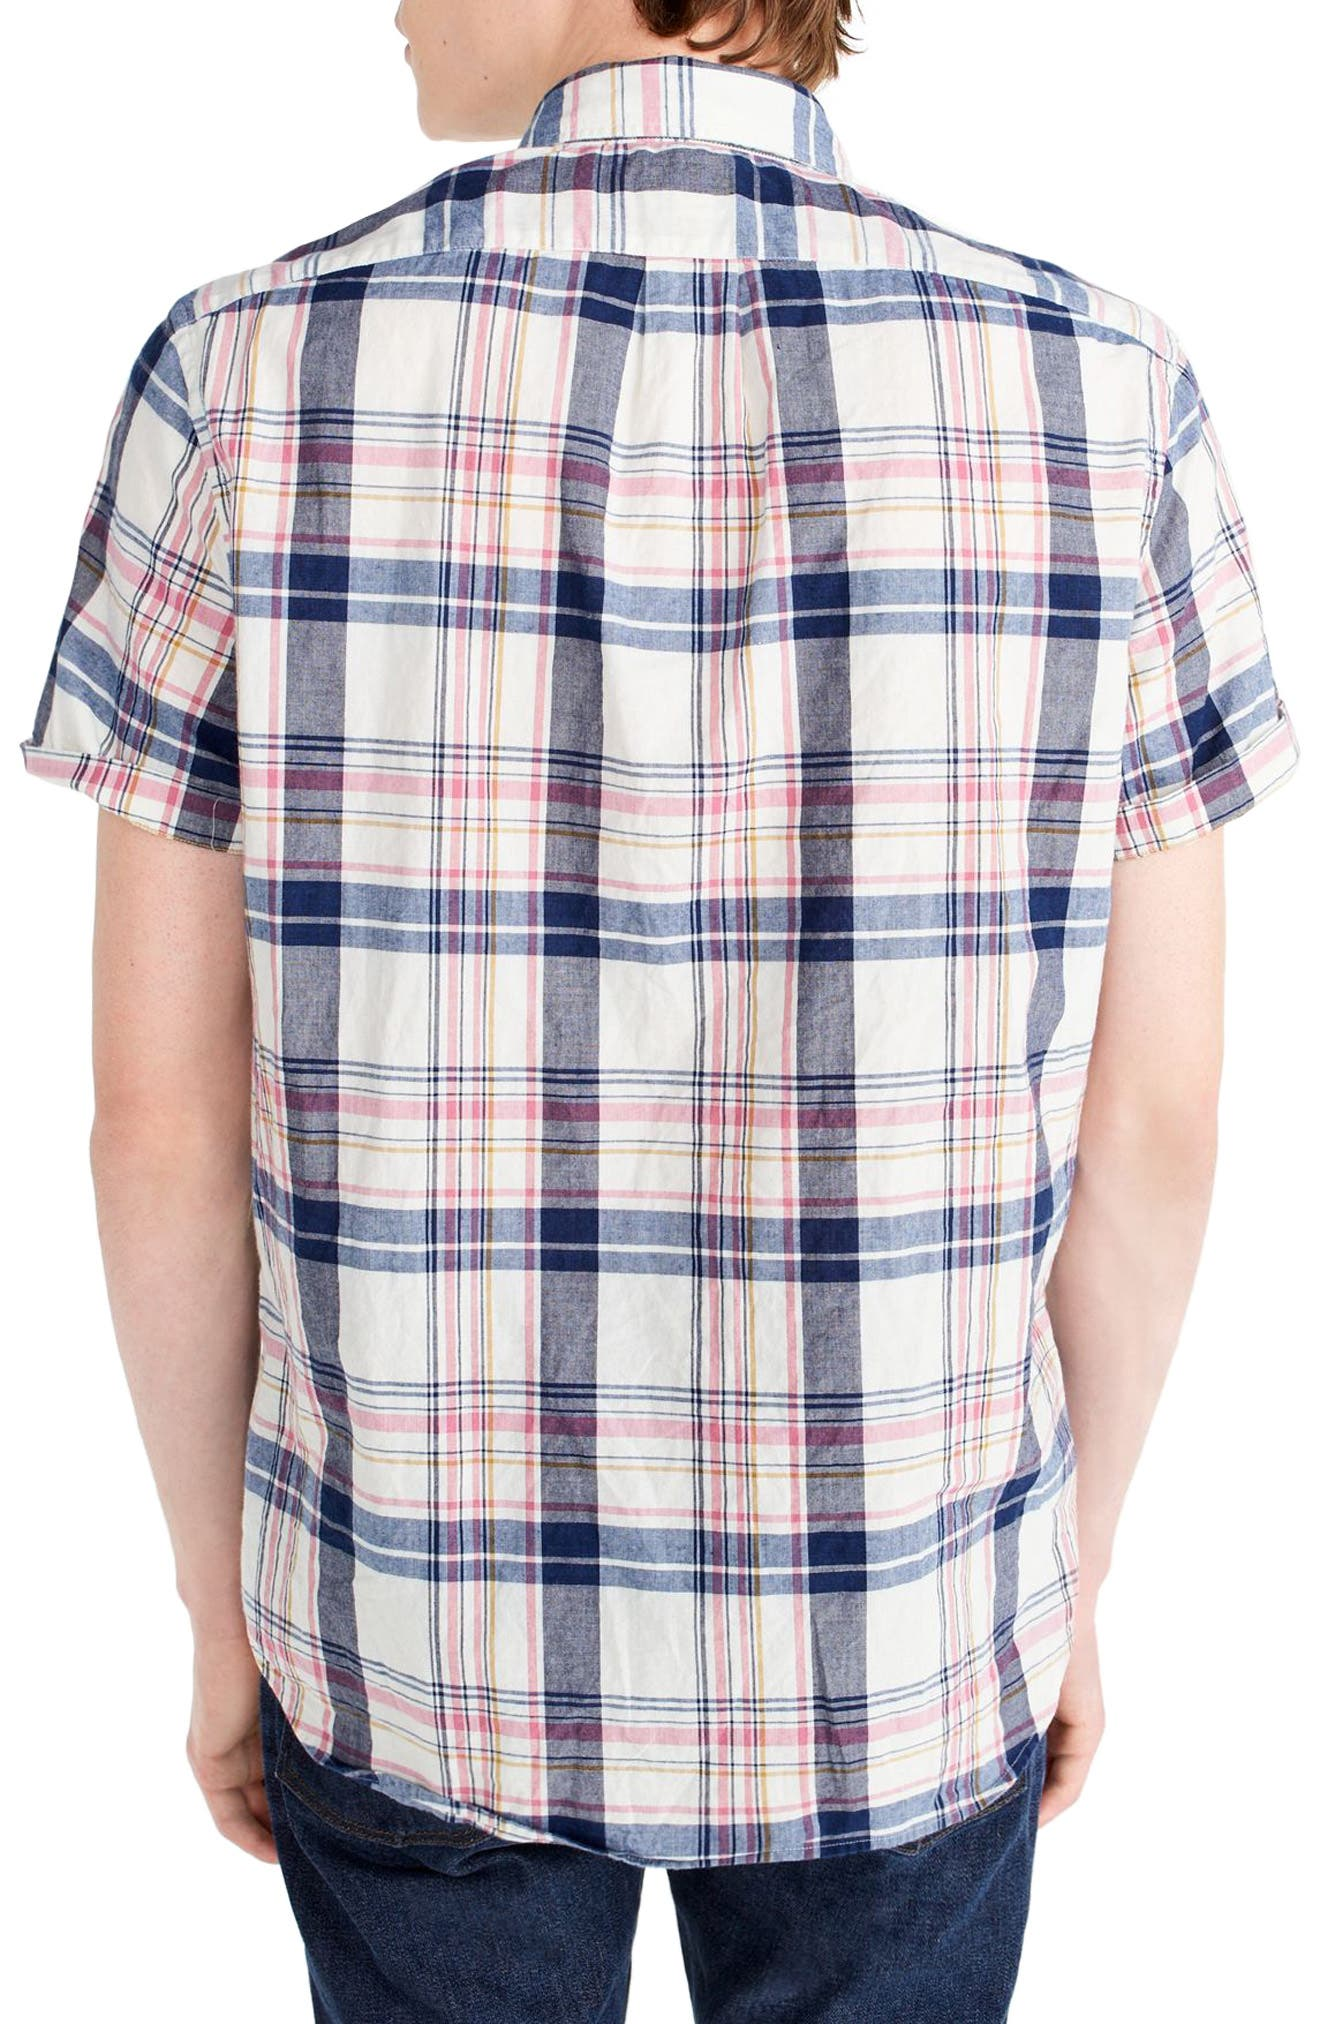 Indigo Plaid Short Sleeve Madras Shirt,                             Alternate thumbnail 2, color,